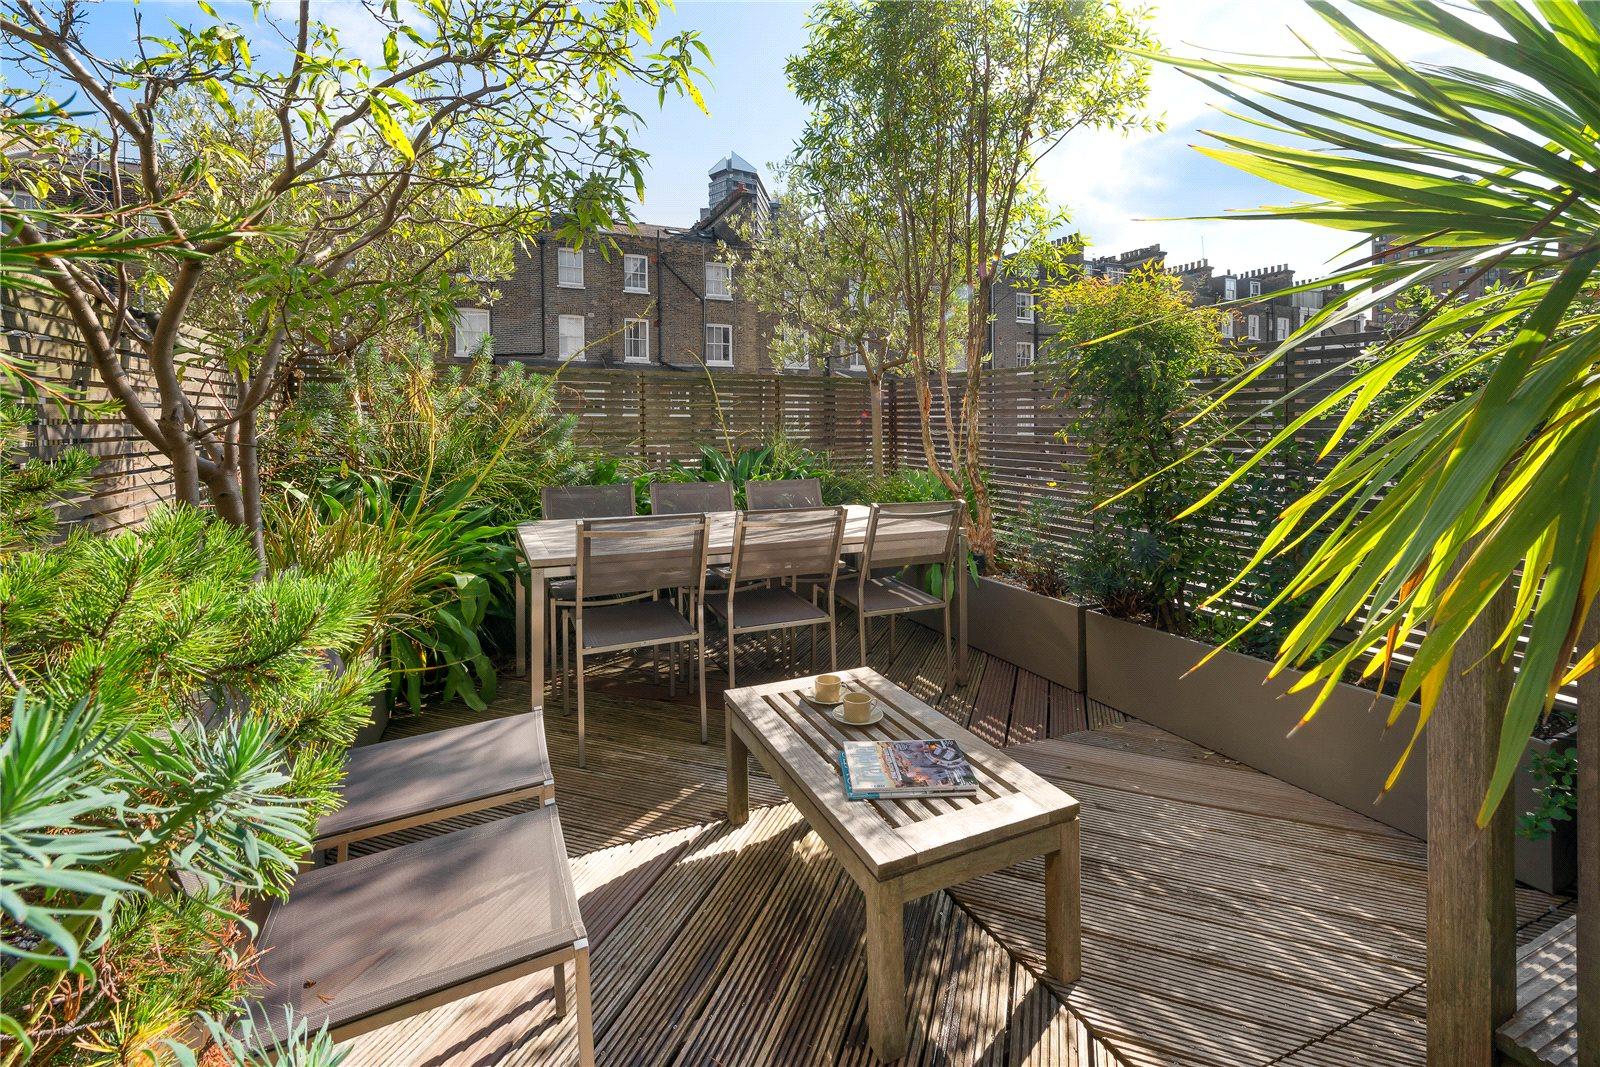 Appartamenti per Vendita alle ore Cornwall Gardens, South Kensington, London, SW7 South Kensington, London, Inghilterra